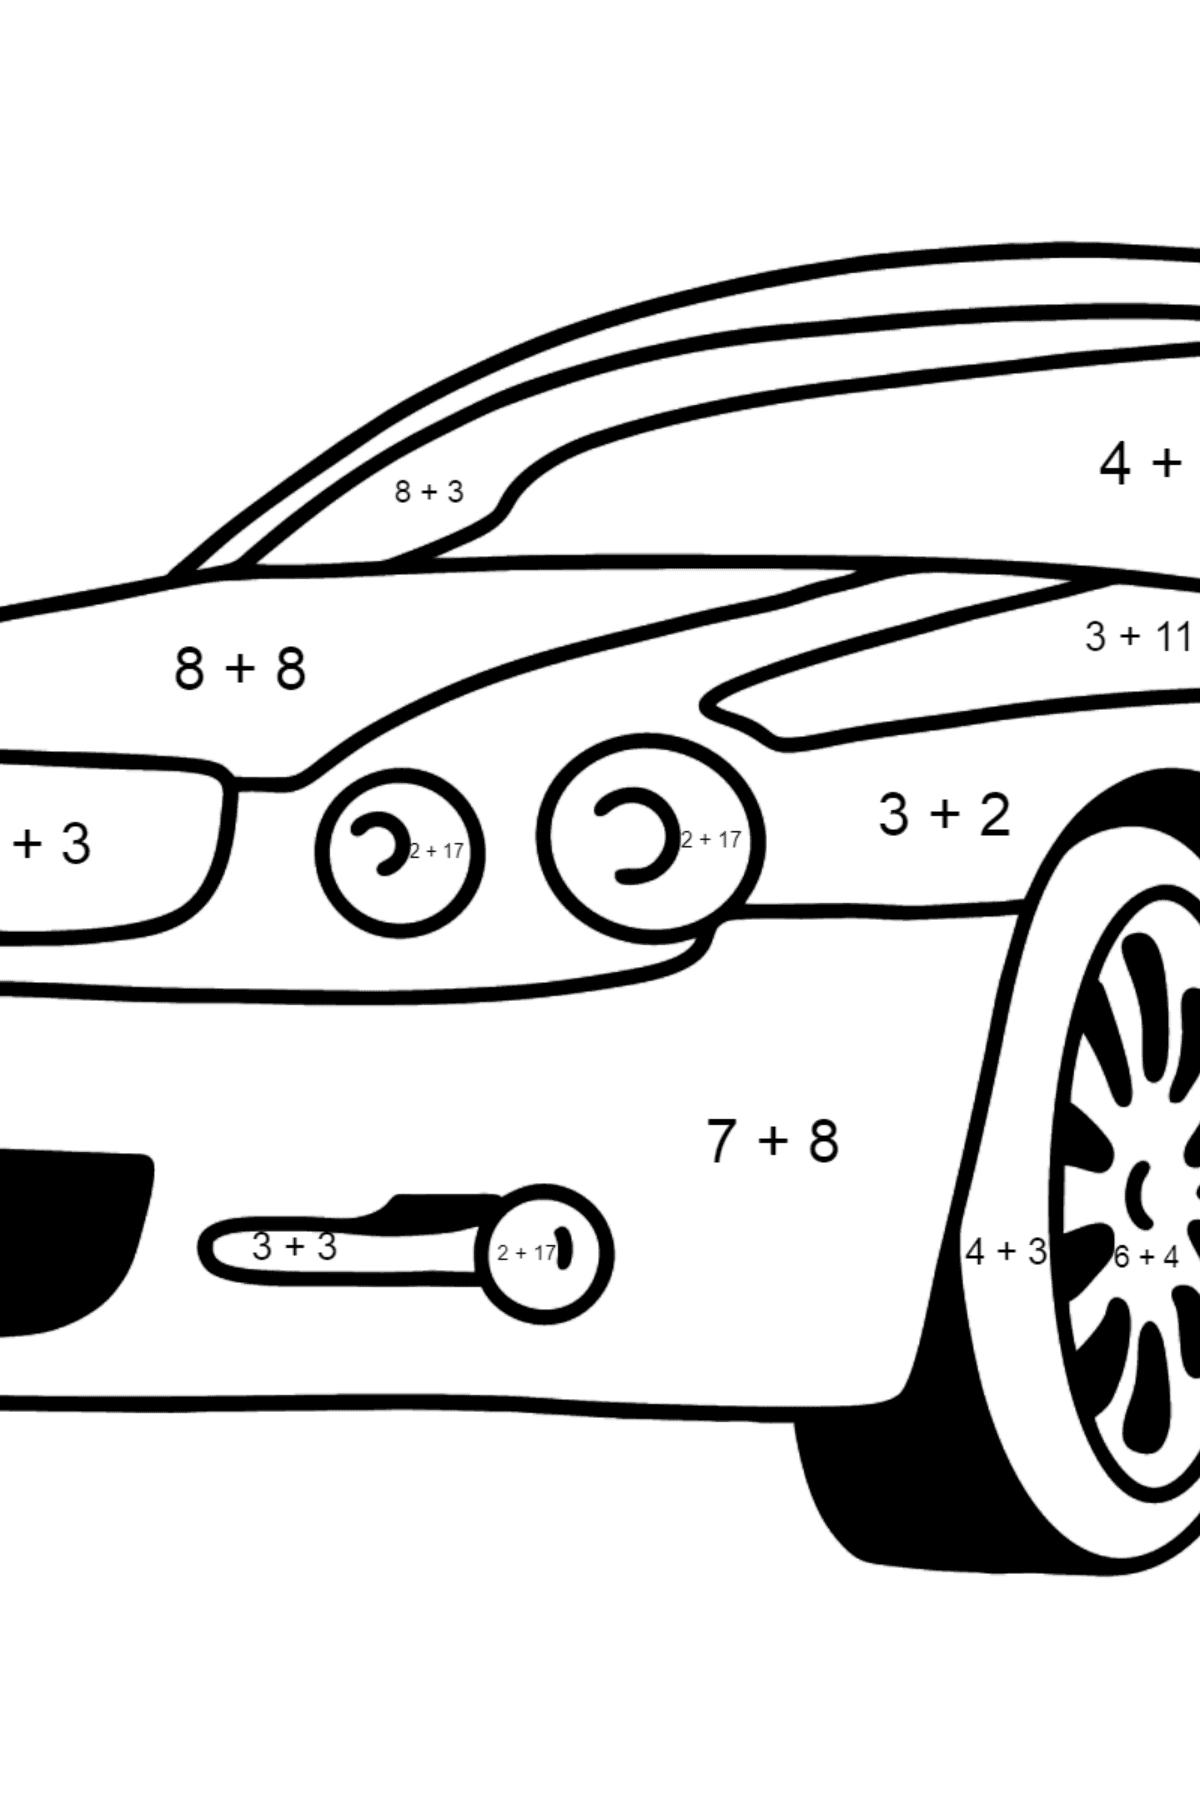 Jaguar GT coloring page - Math Coloring - Addition for Kids